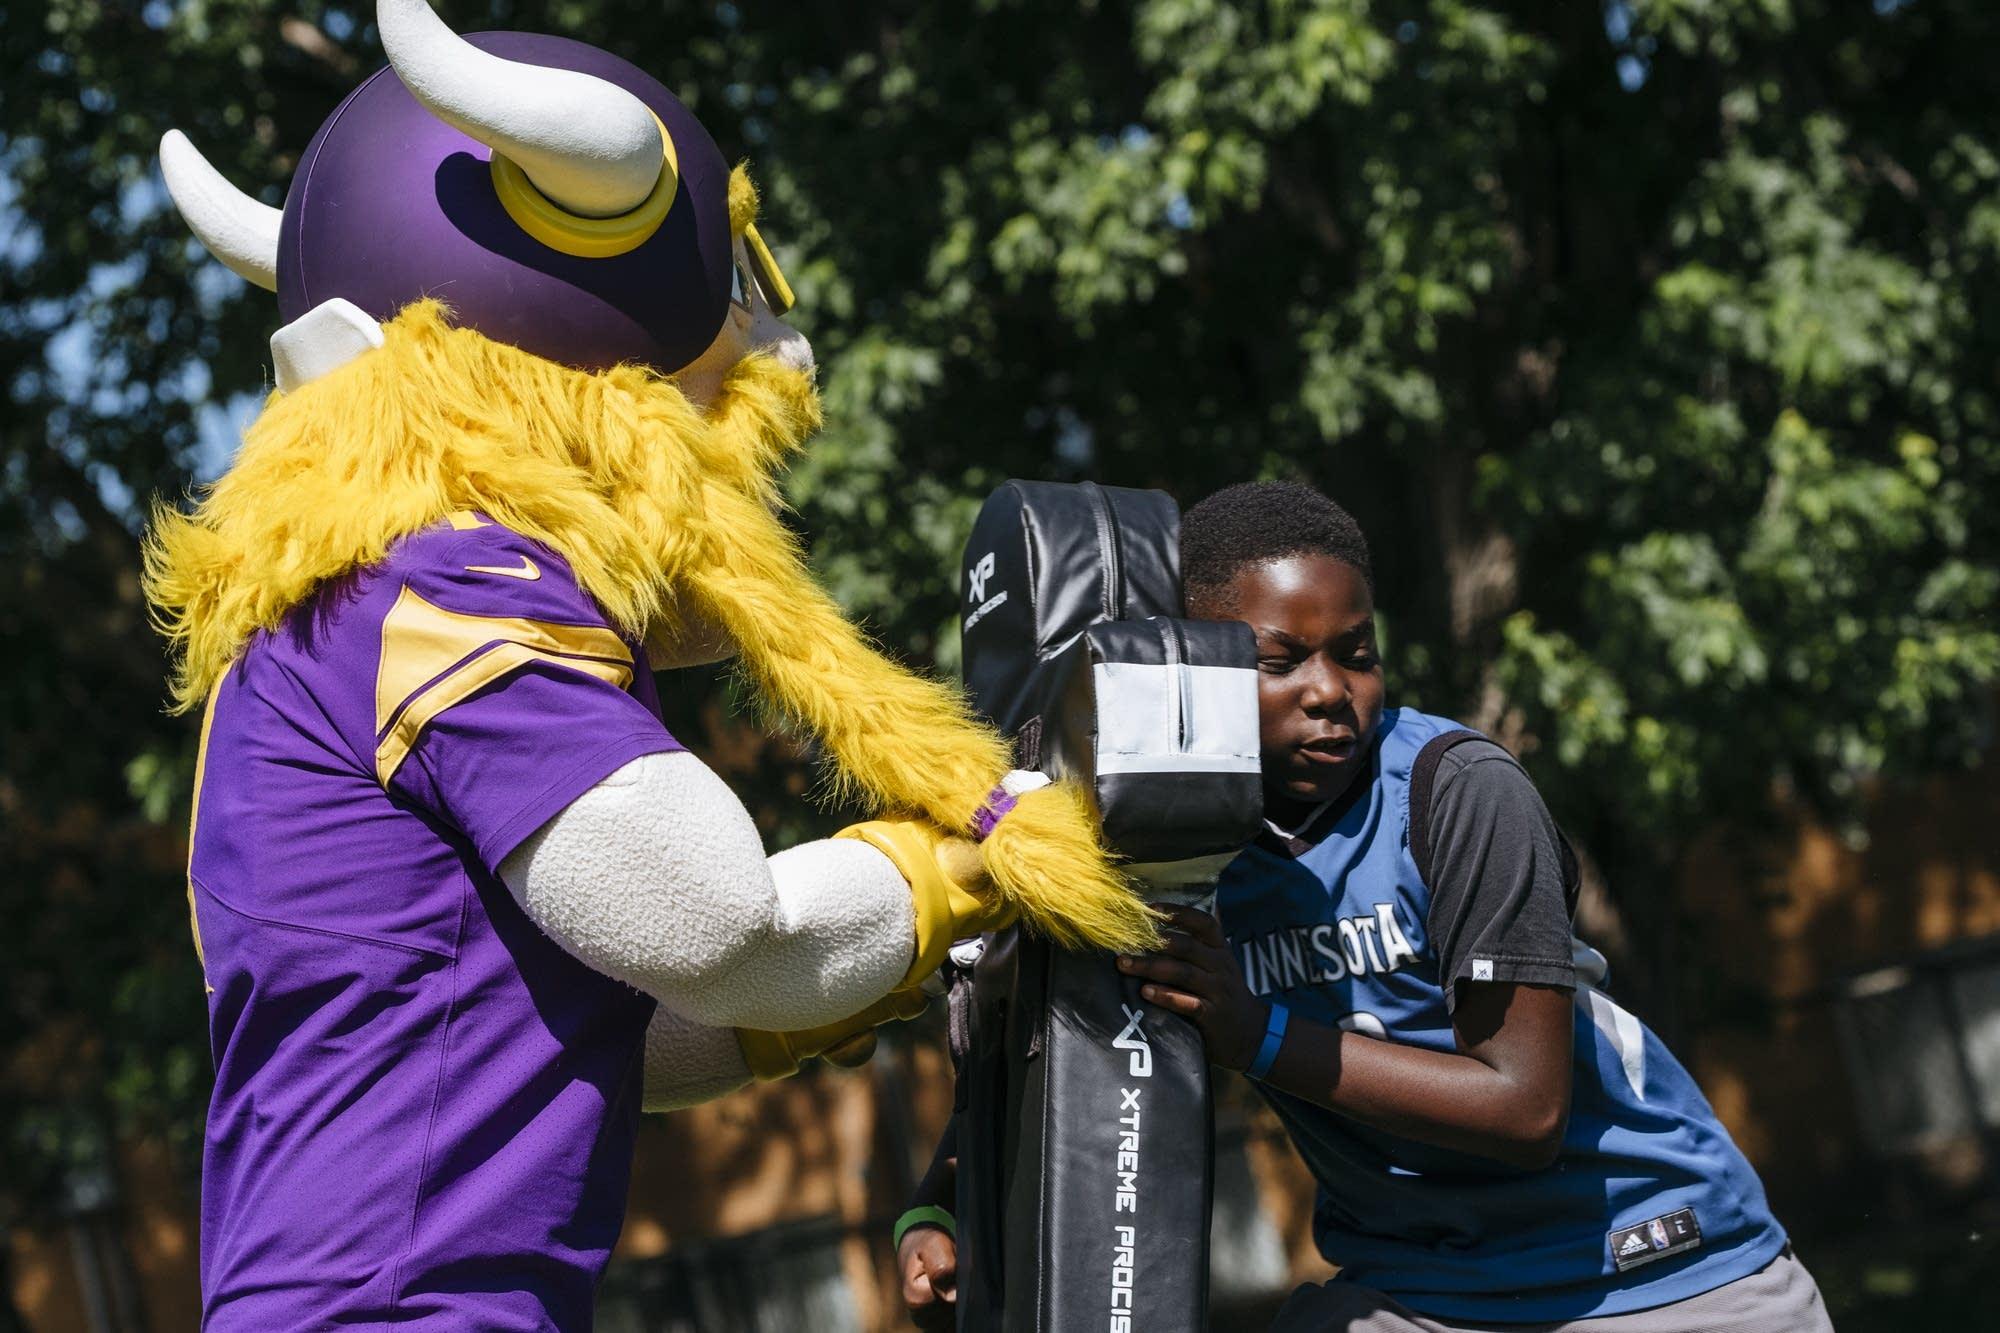 13-year-old Eric Aduda lays a hit on Viktor the Viking.